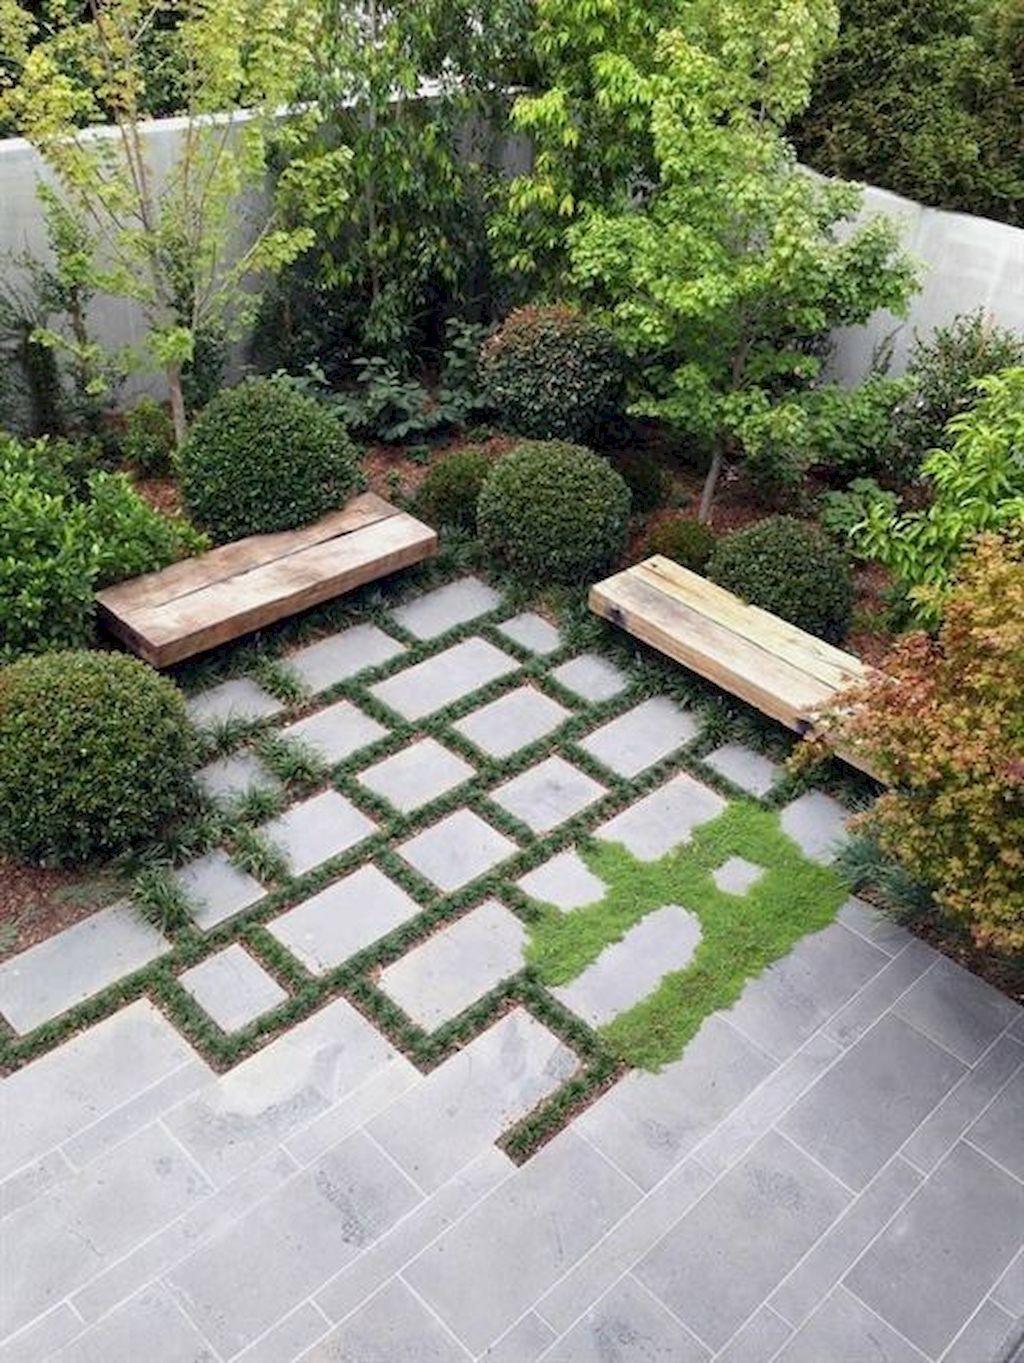 17 Best Diy Garden Ideas Project Vegetable Gardening Raised Beds Small Garden Design Small Garden Landscape Small Backyard Landscaping